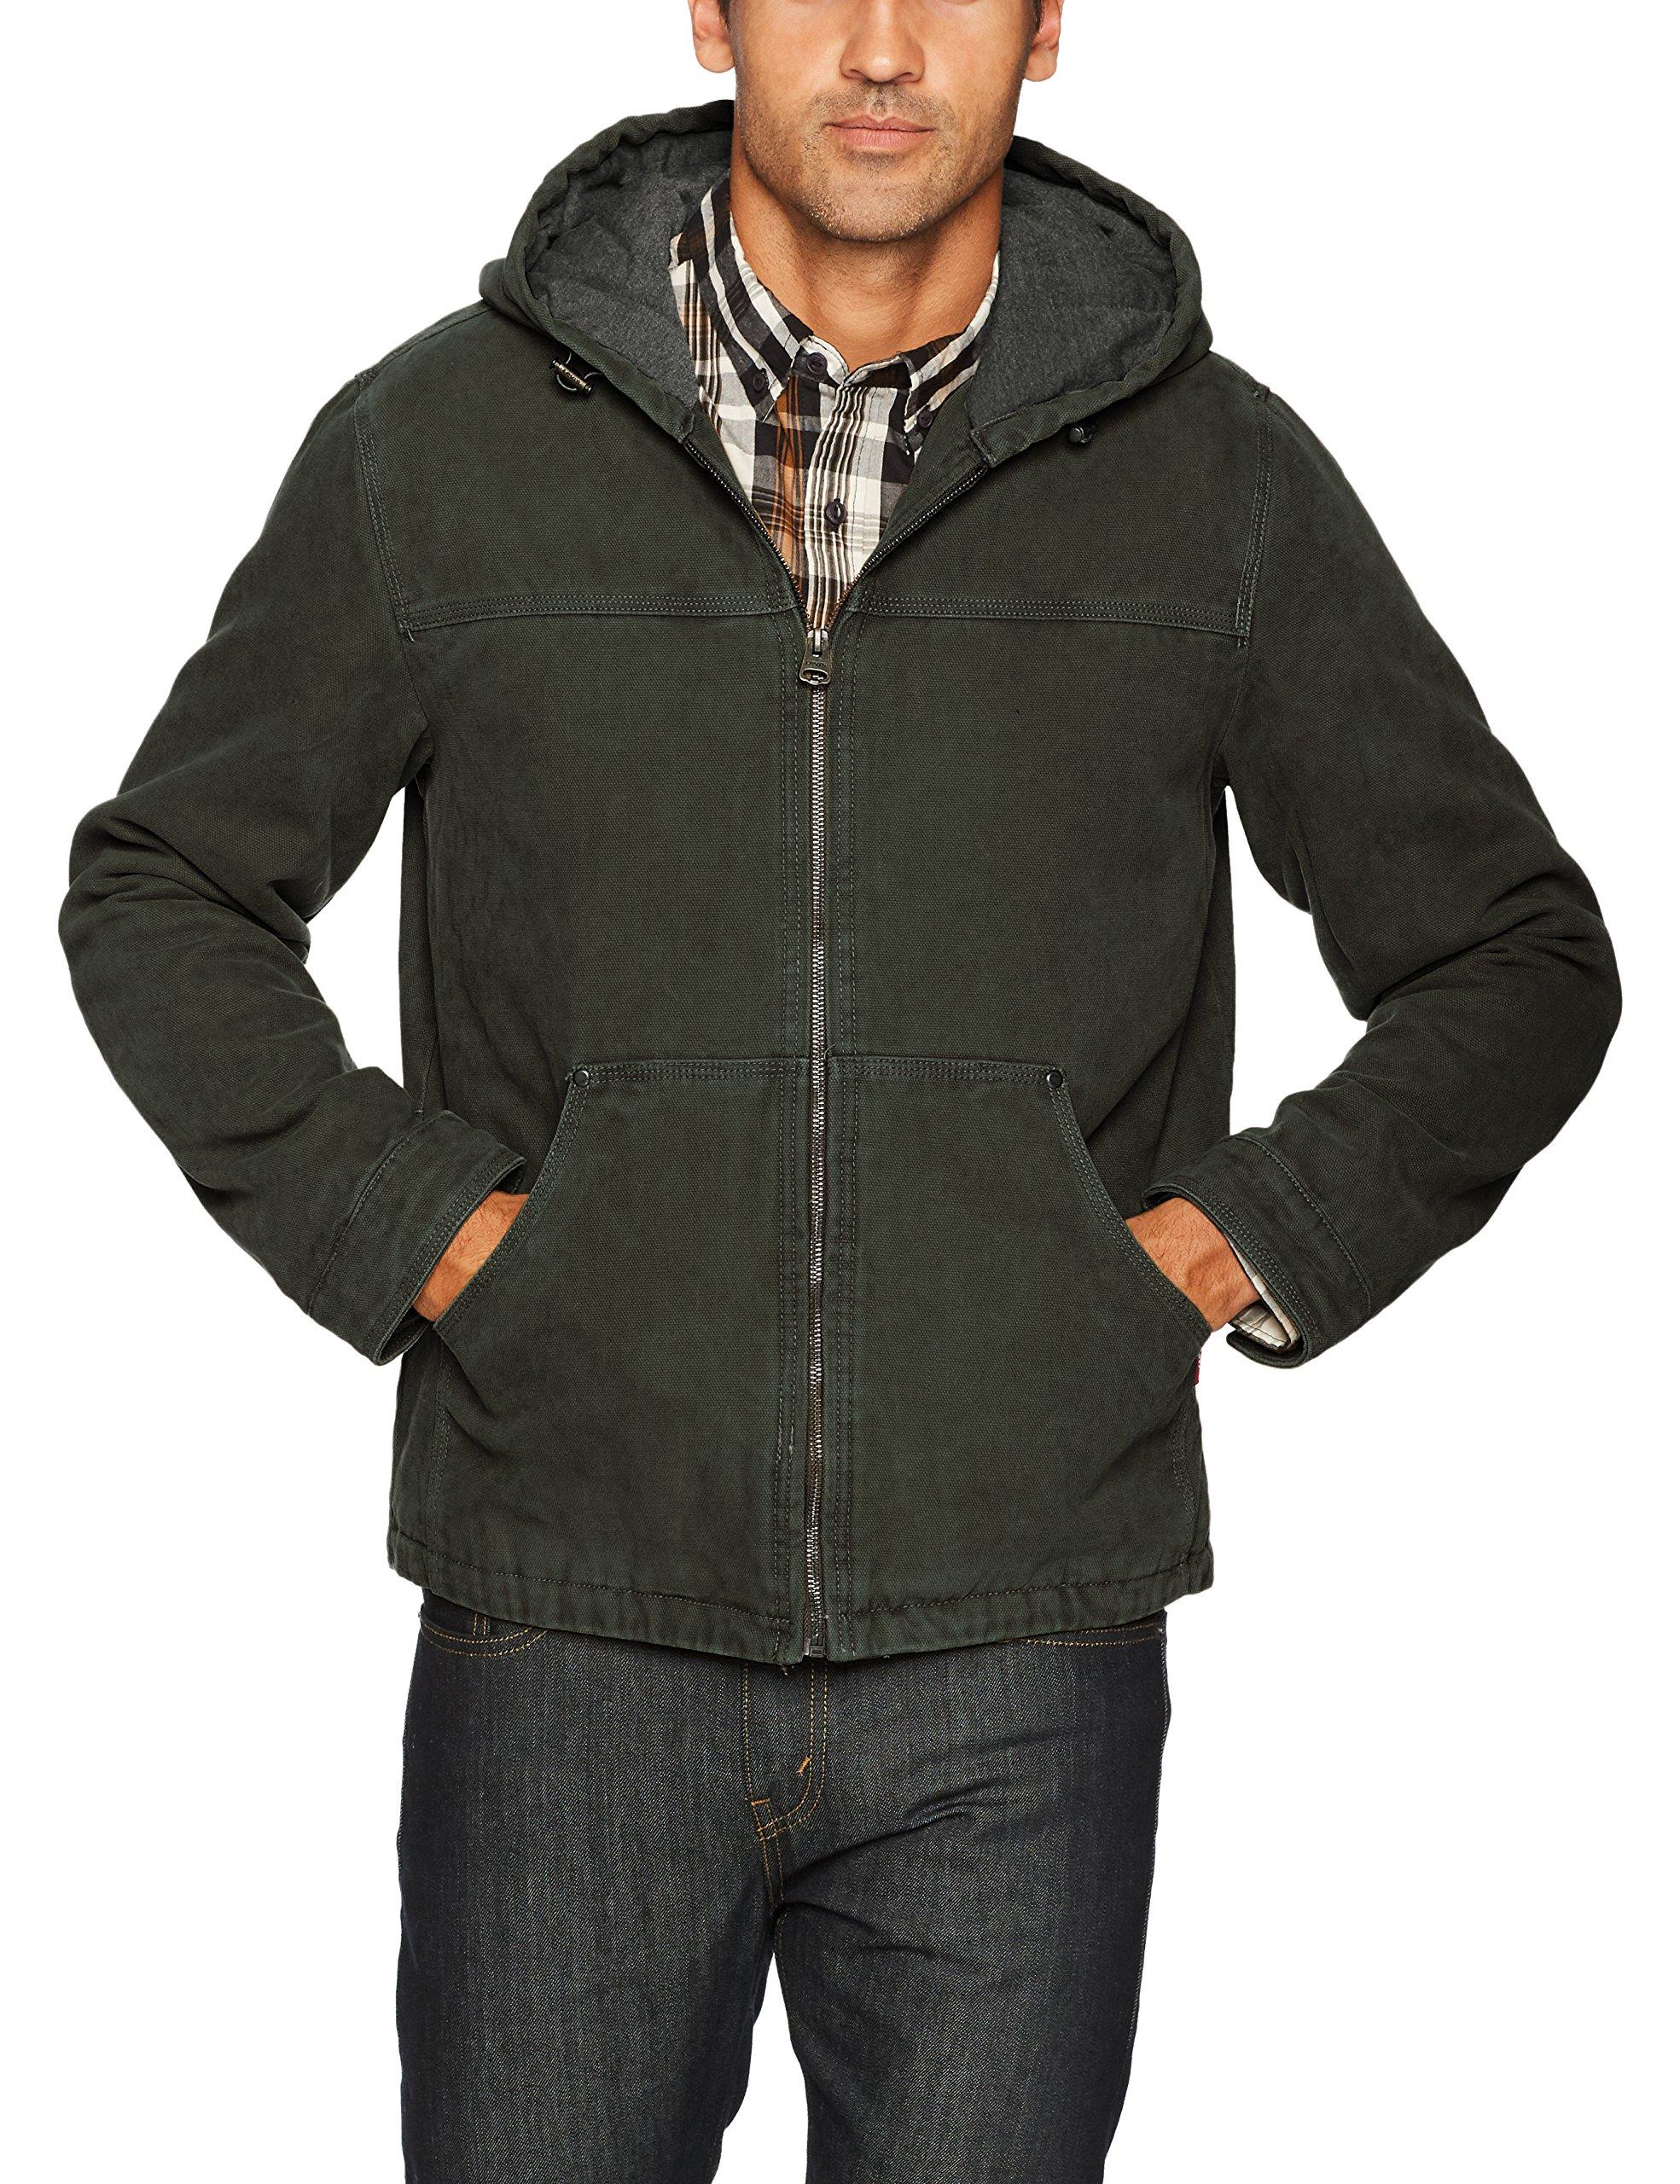 Levi's Men's Cotton Canvas Fleece Lined Hoody Jacket, Olive, X-Large